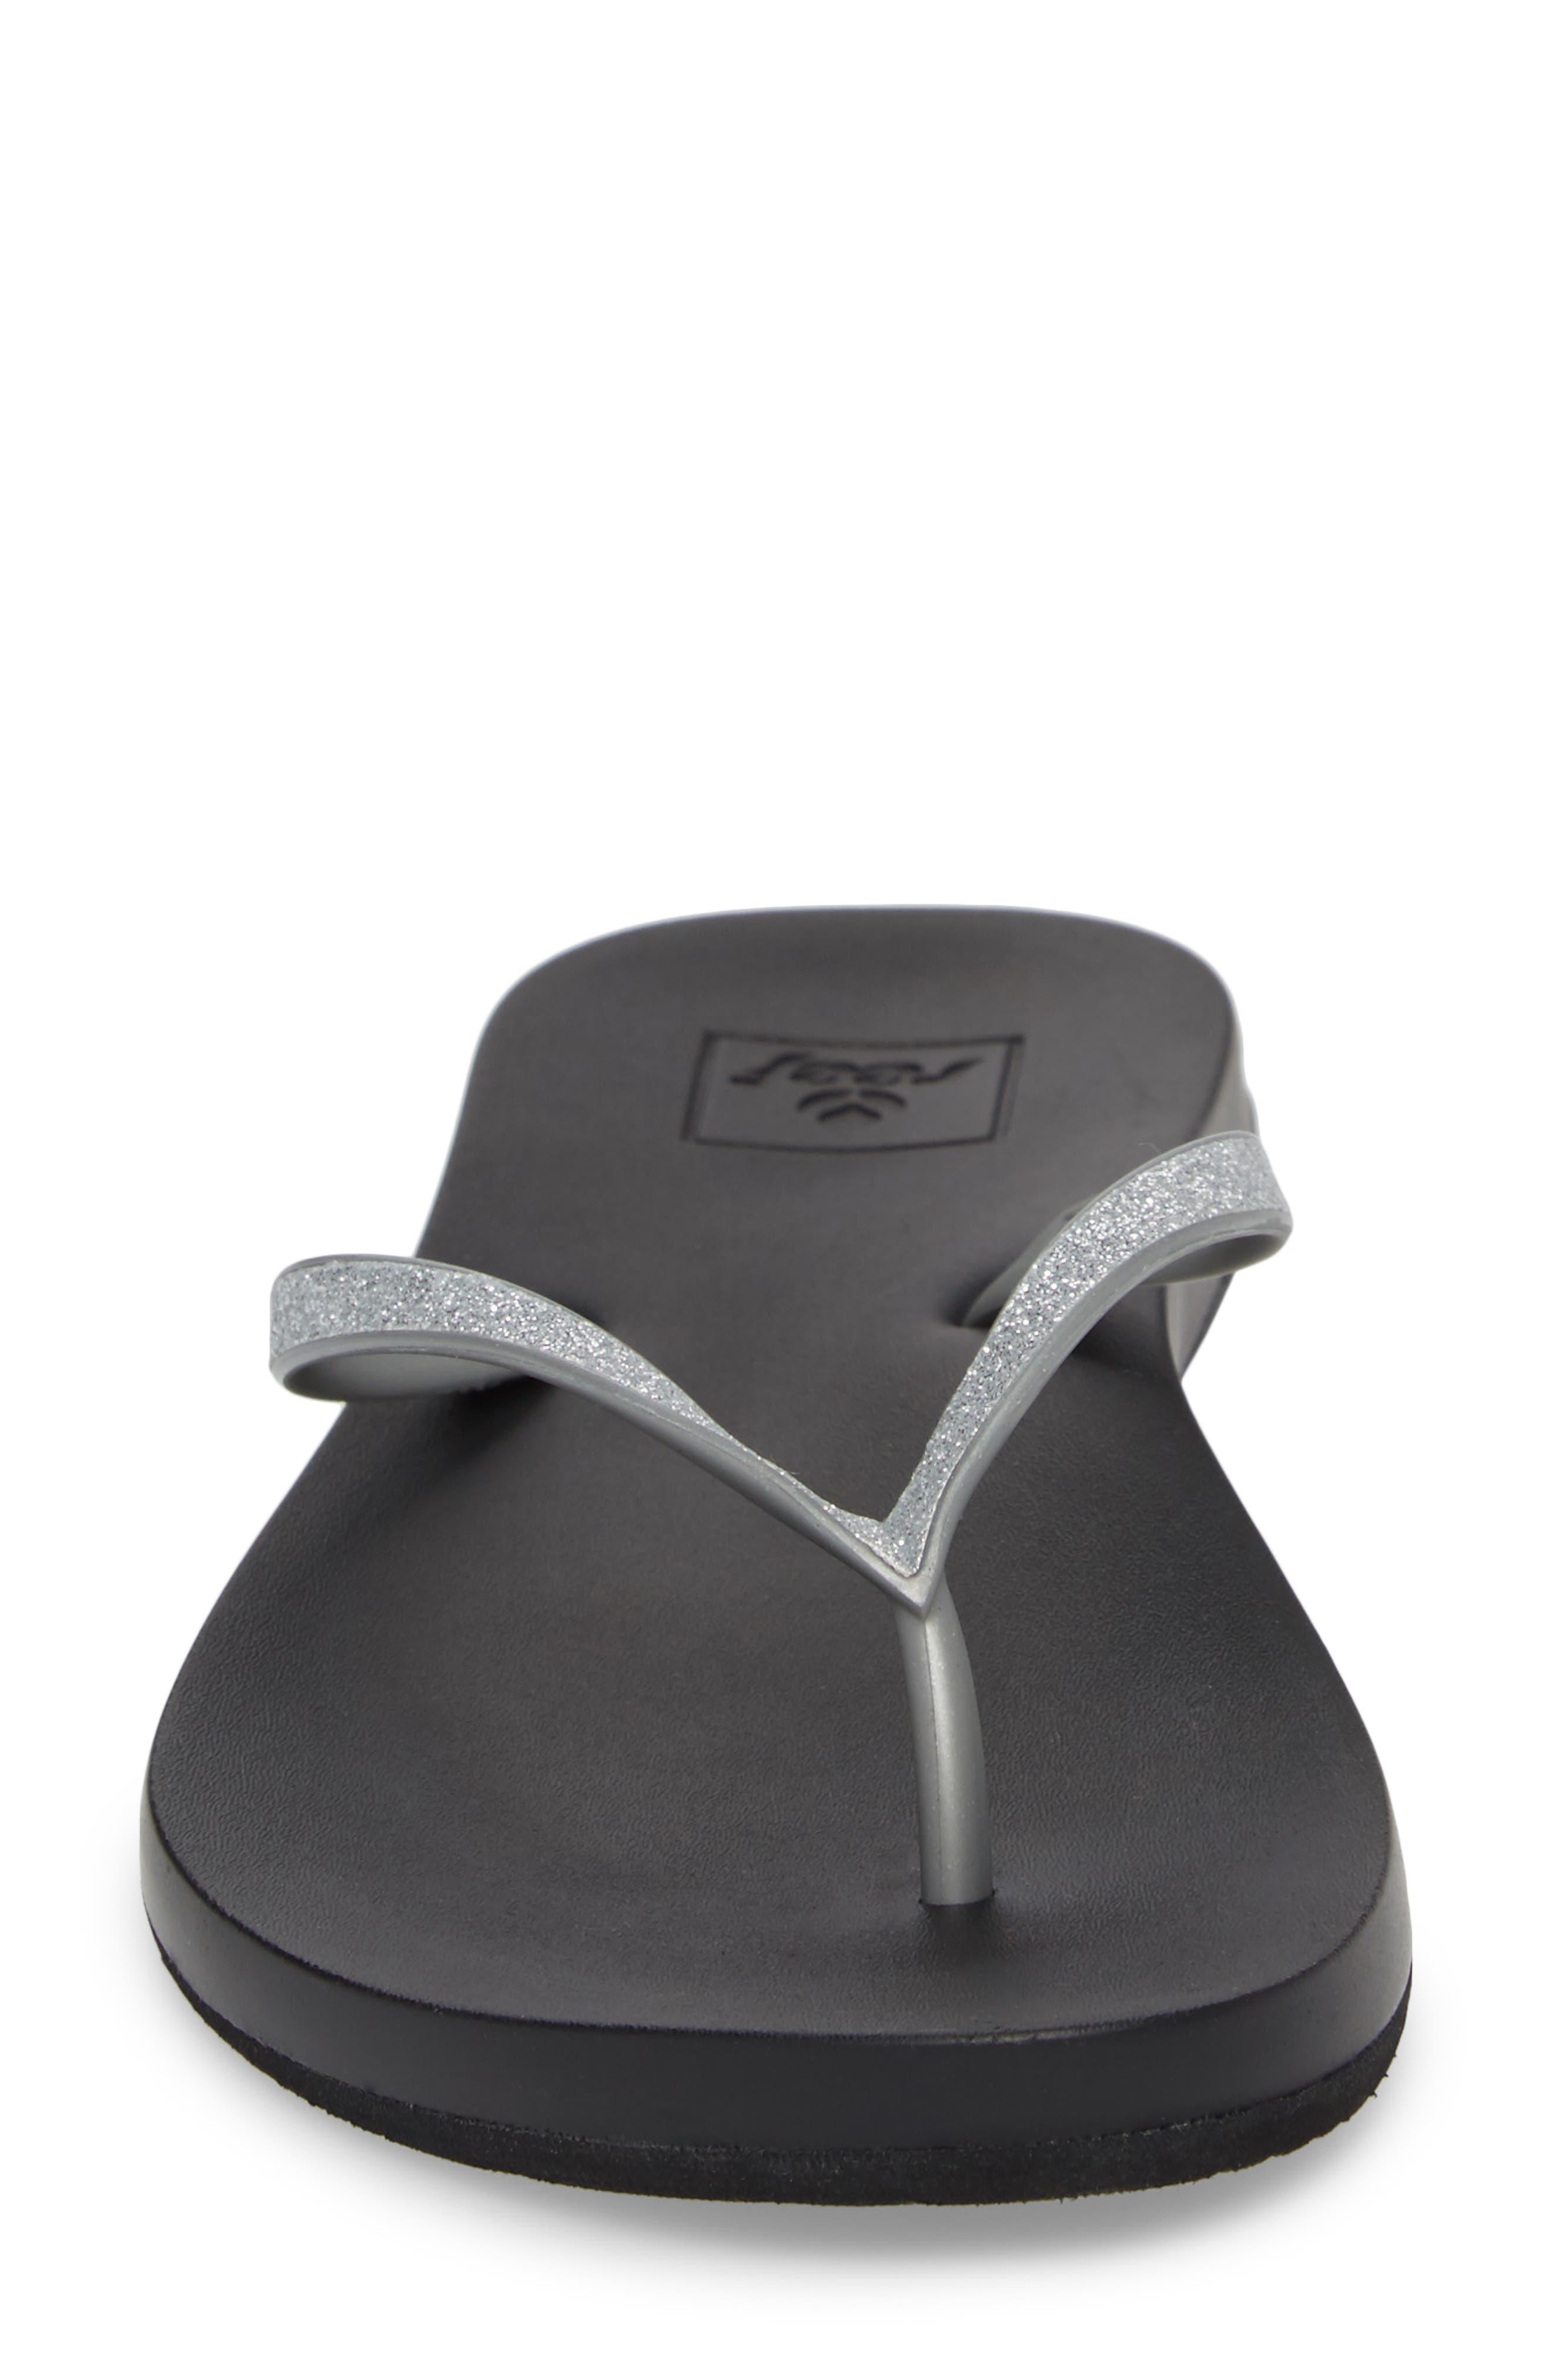 Cushion Bounce Stargazer Flip Flop,                             Alternate thumbnail 4, color,                             Silver